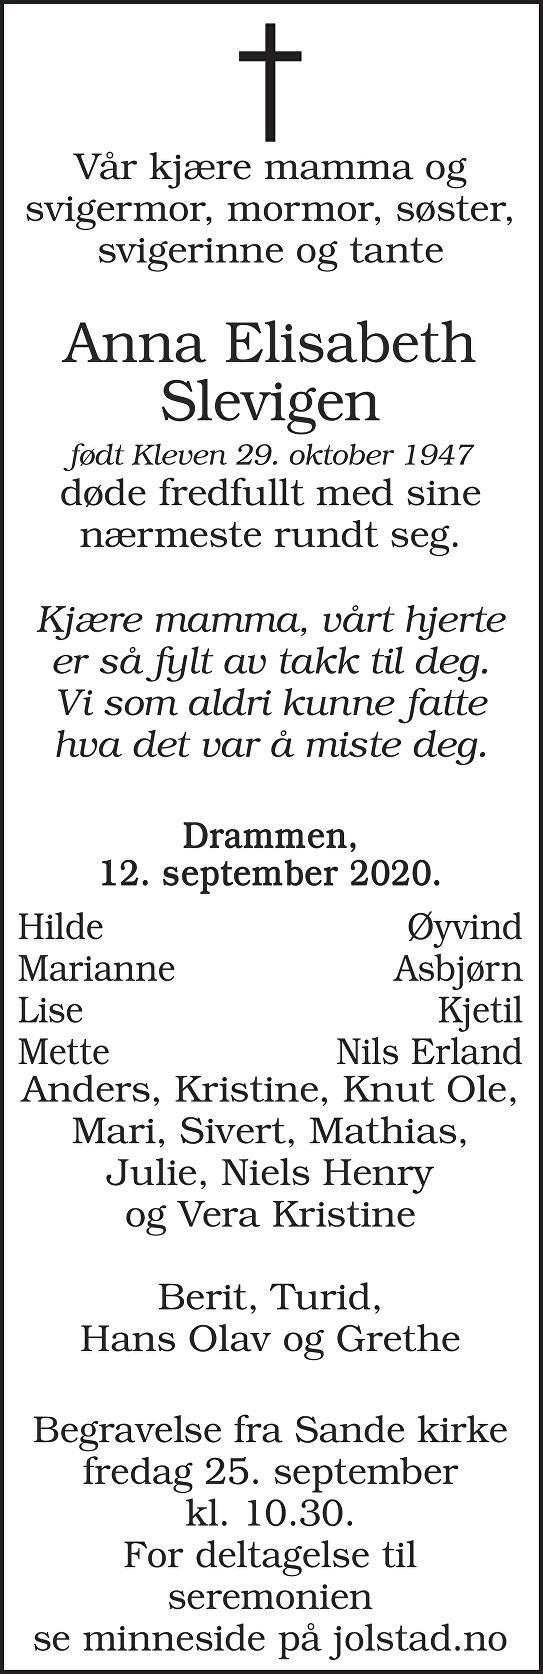 Anna Elisabeth Slevigen Dødsannonse